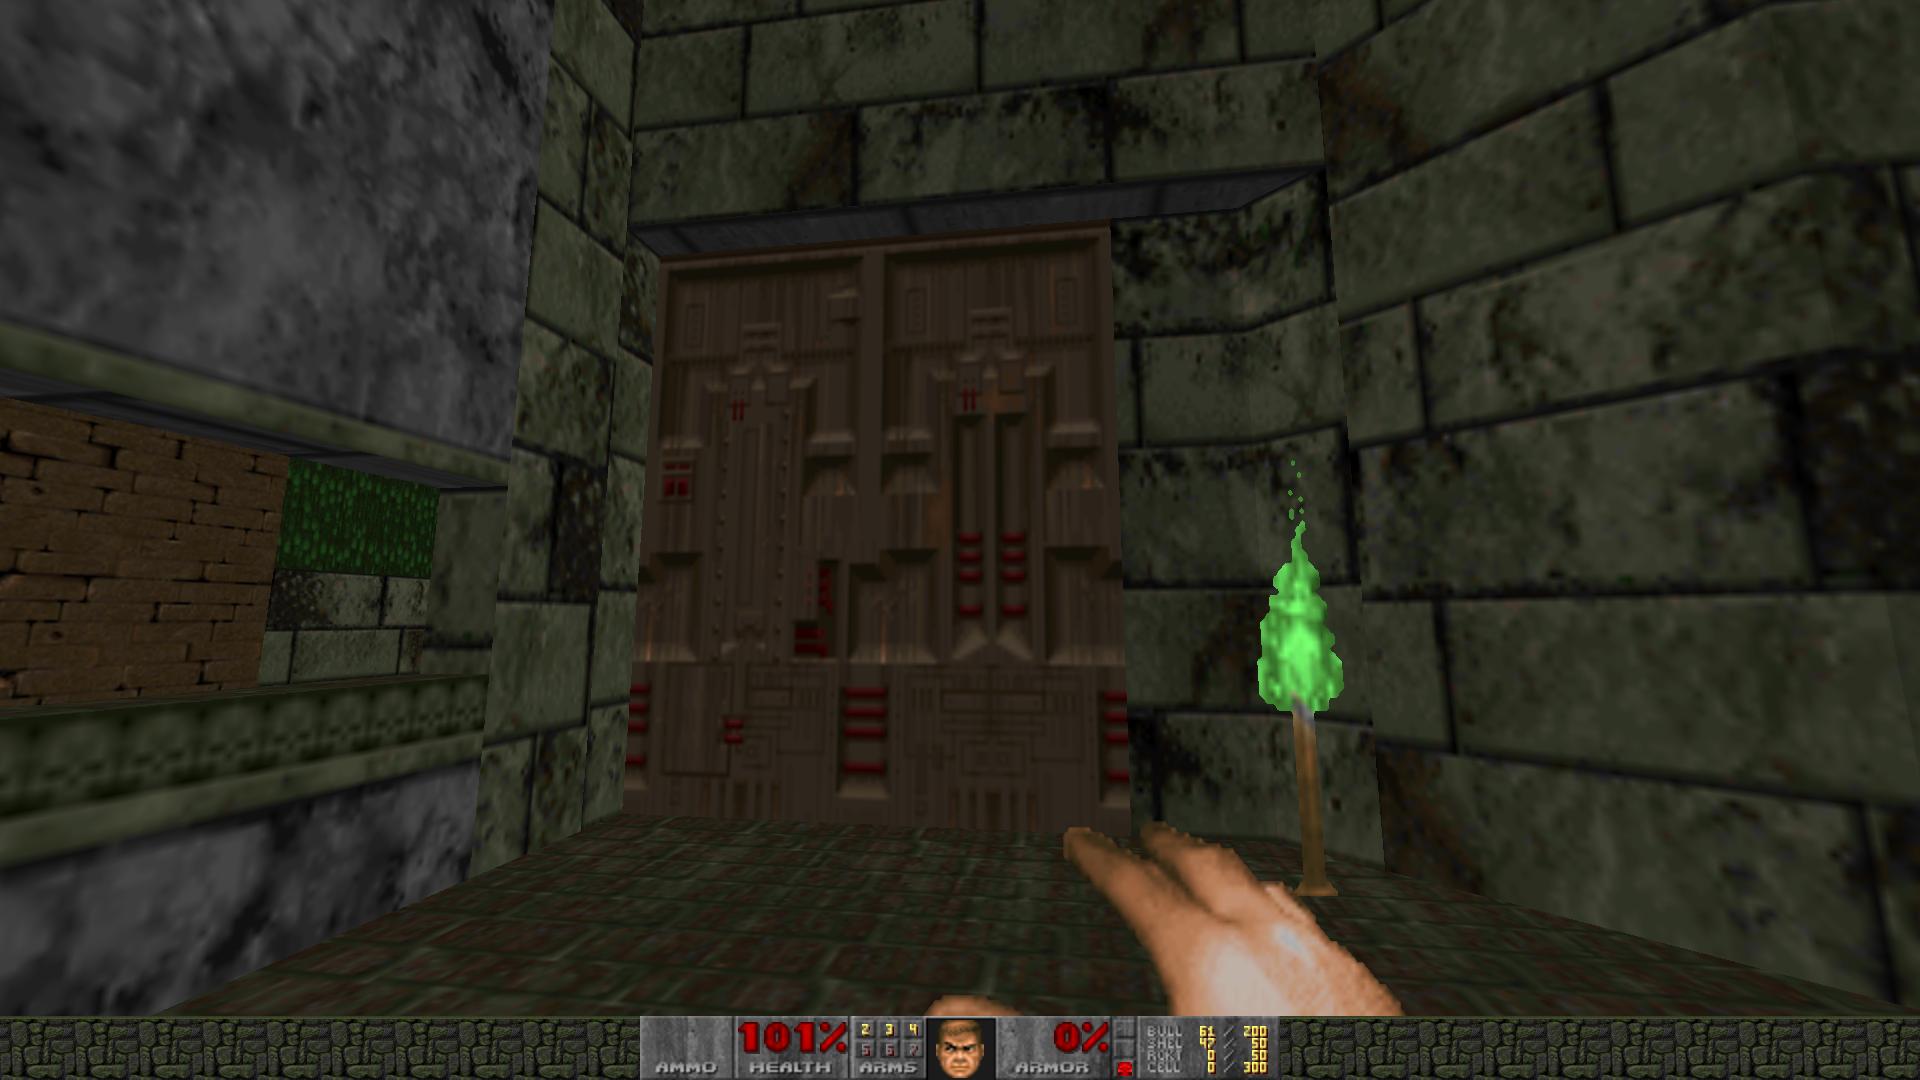 Screenshot_Doom_20200513_174717.png.6275f1bdff37f8d292a71691f8ac0f40.png